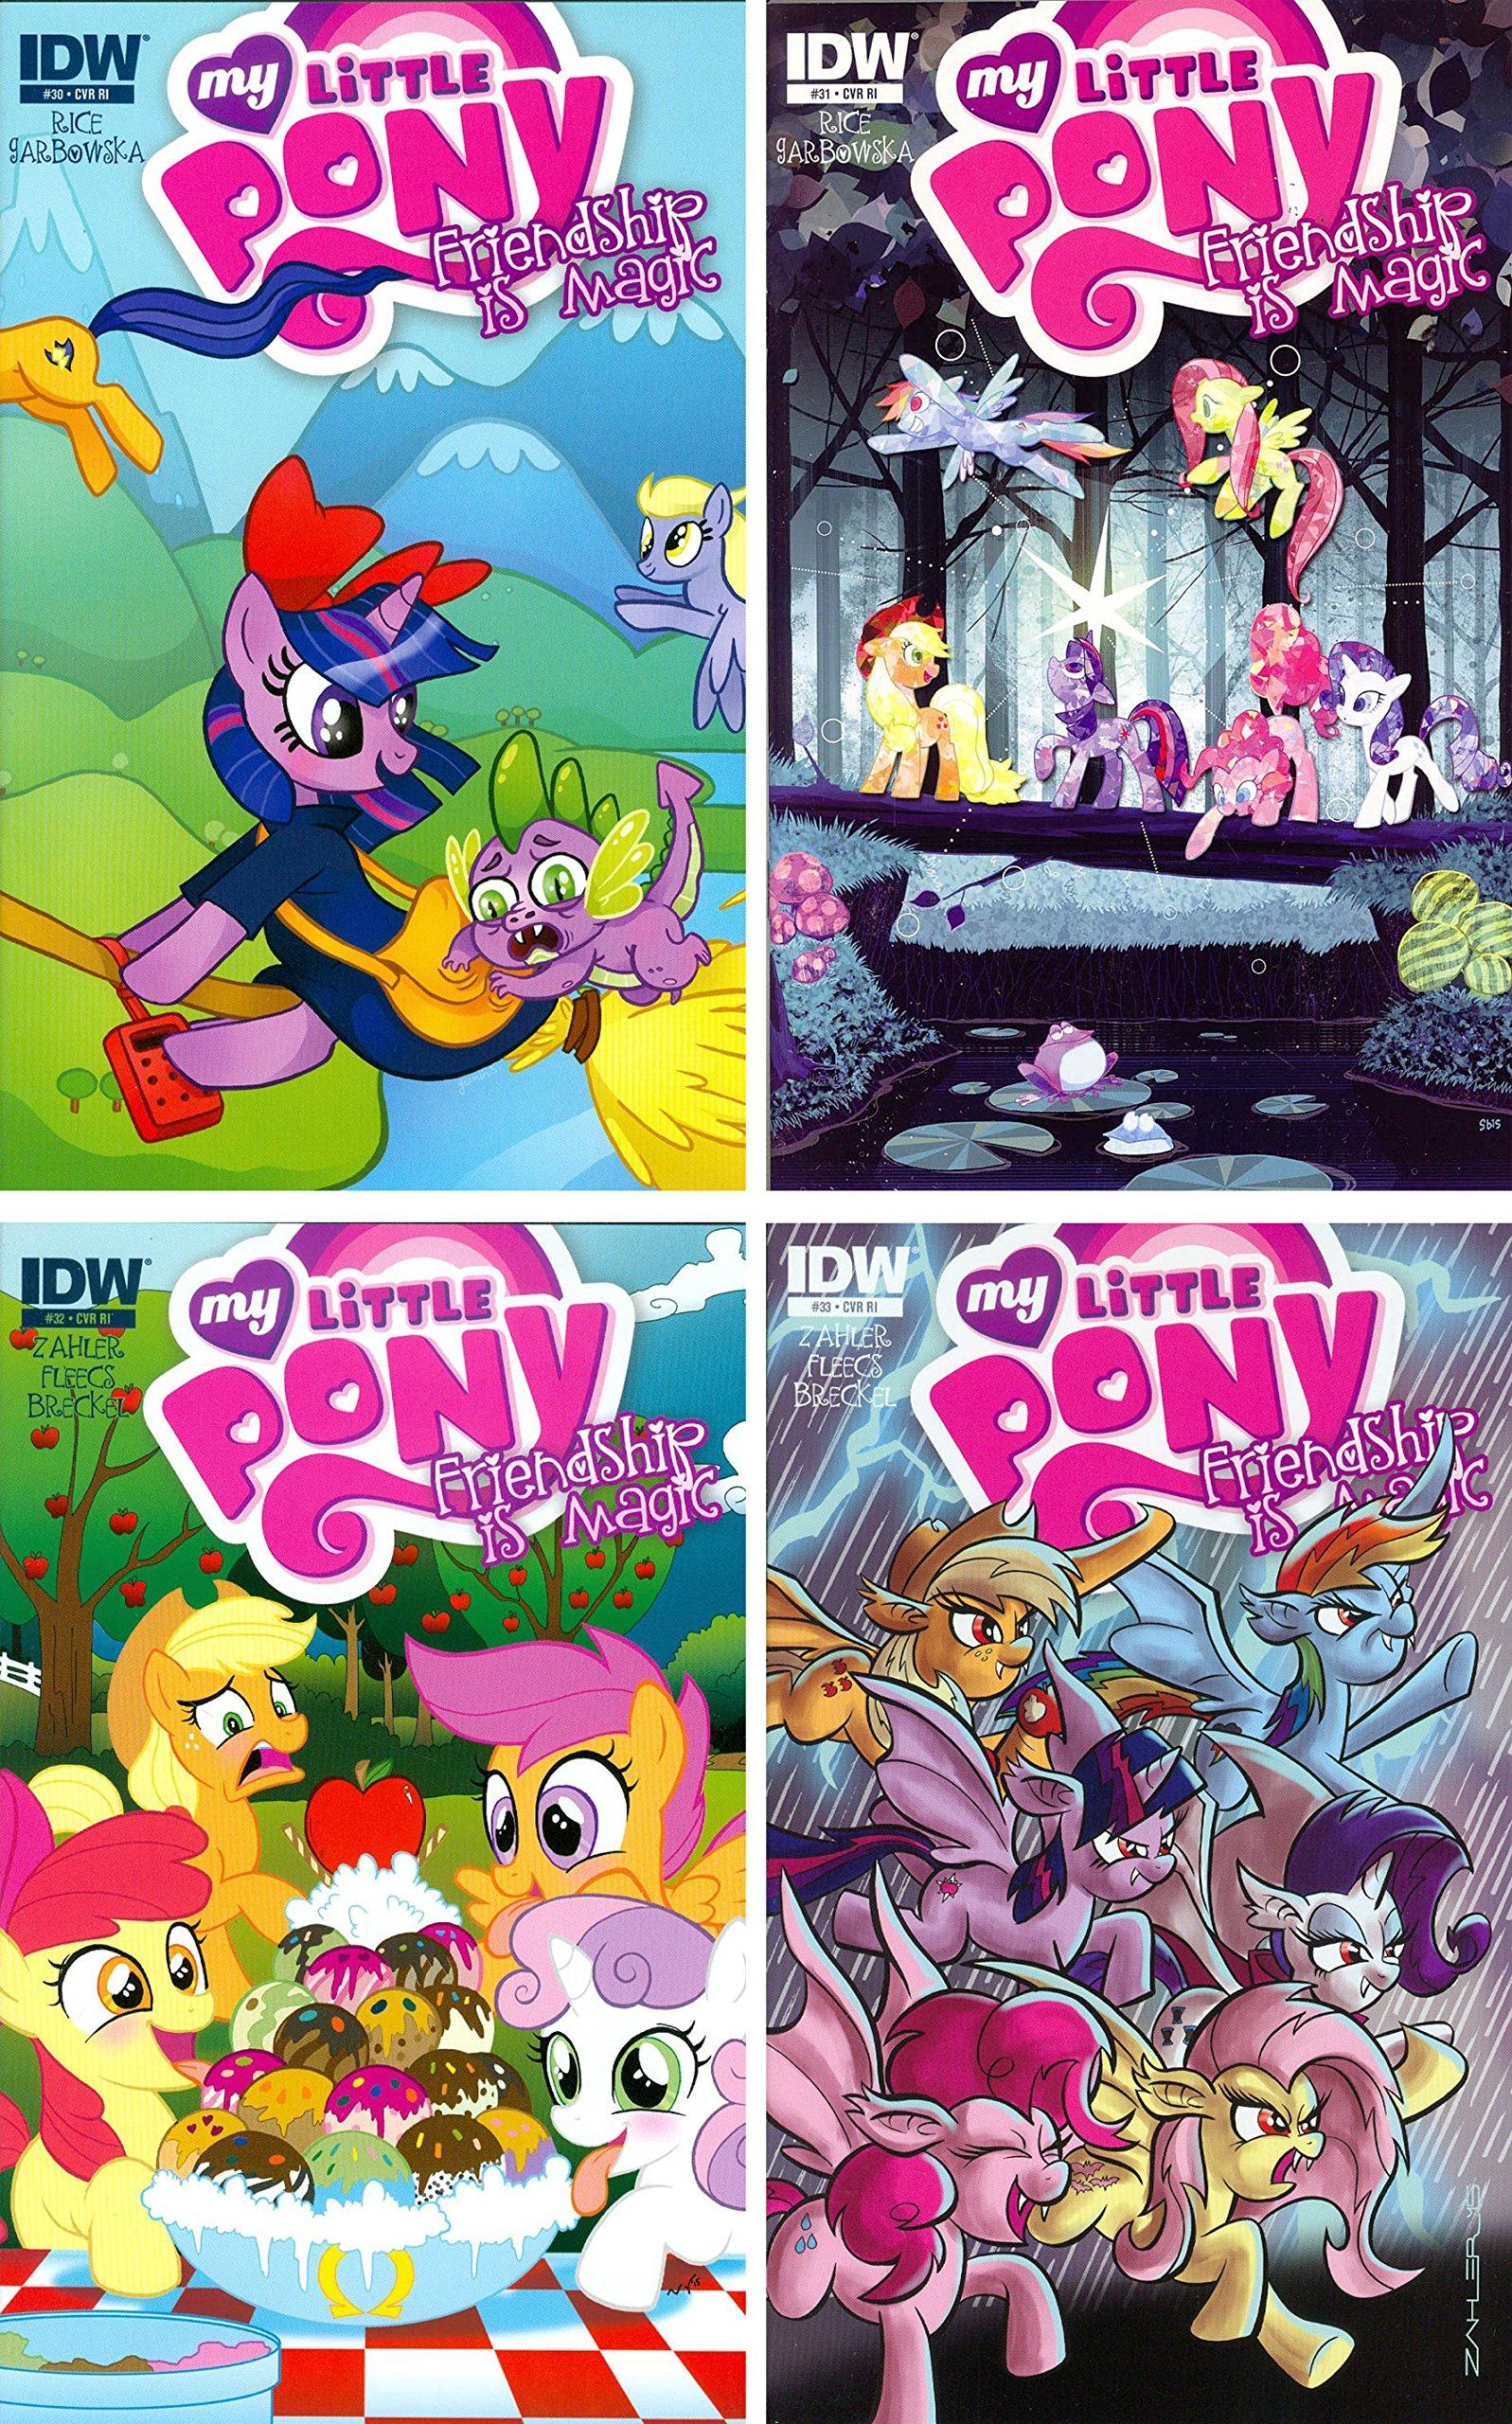 My Little Pony Friendship is Magic Issues 30-33 Retailer Incentive Variant Set - Bundle of Four (4) IDW Comics! PDF